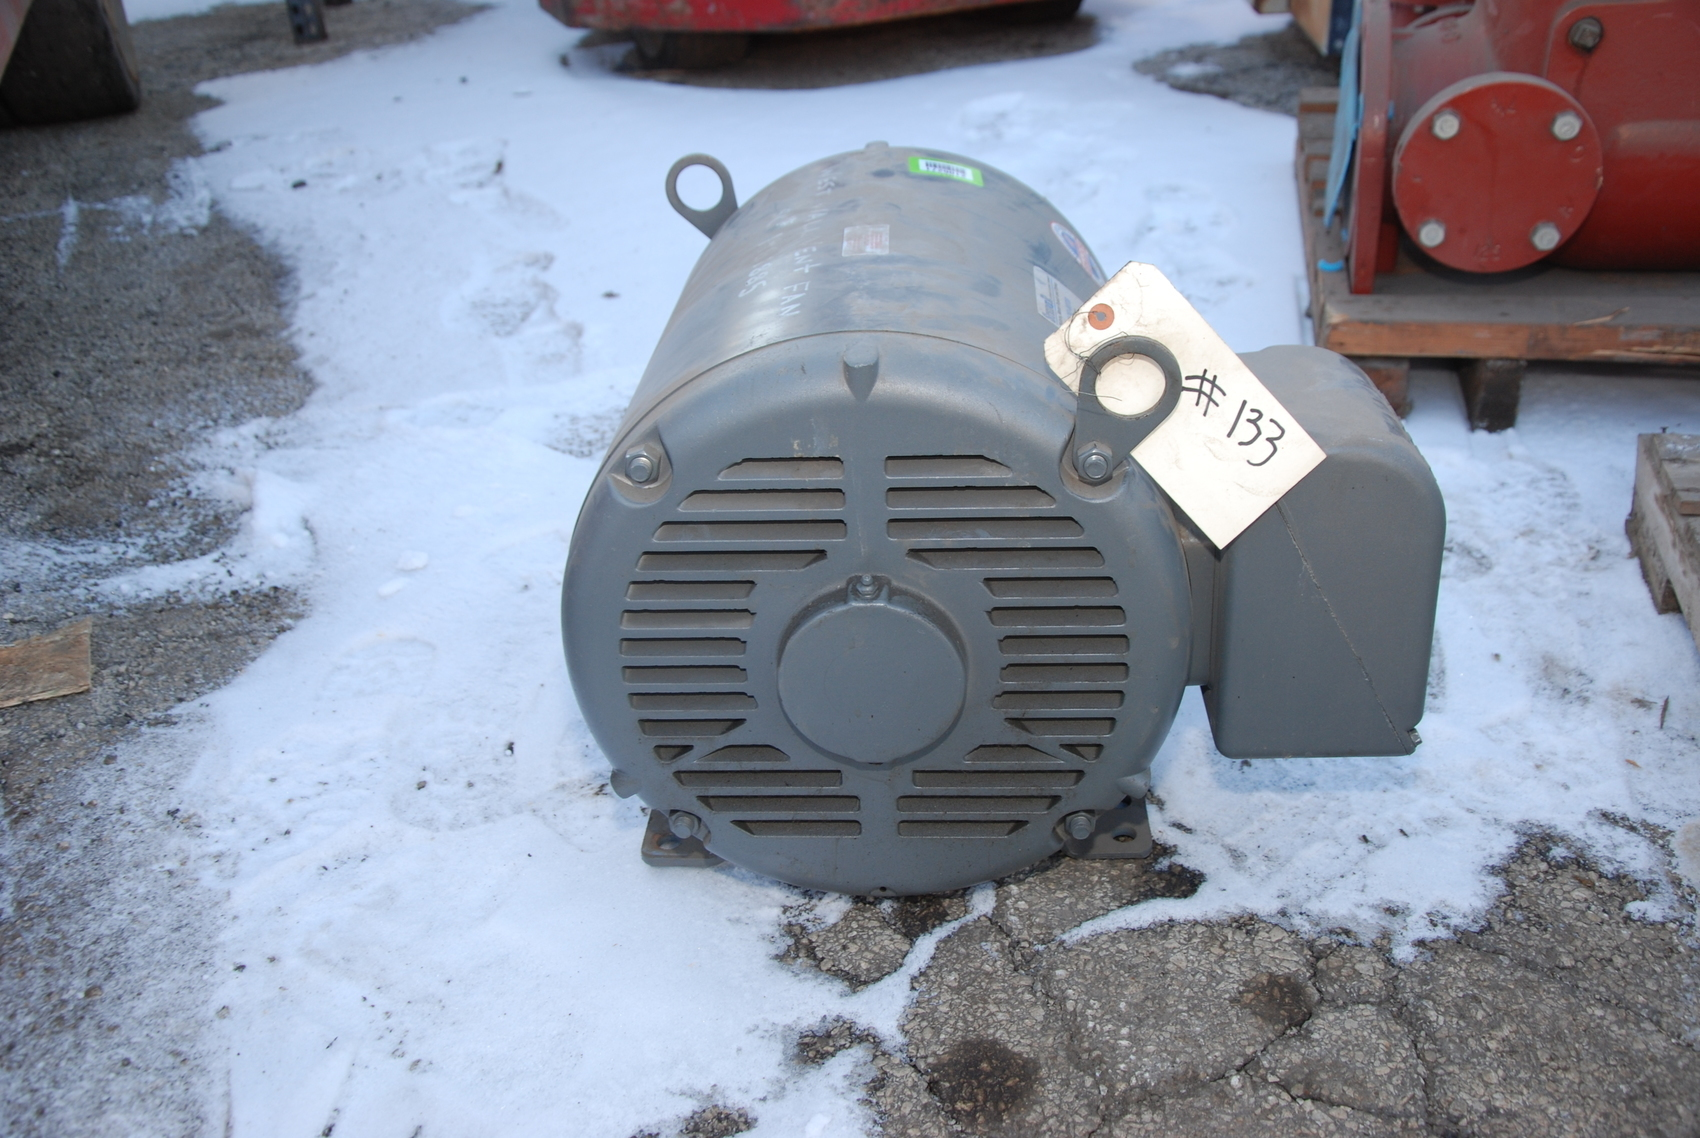 Dsc 0045 Jpg Of Baldor M2531 25 Hp Electric Motor 1760 Rpm